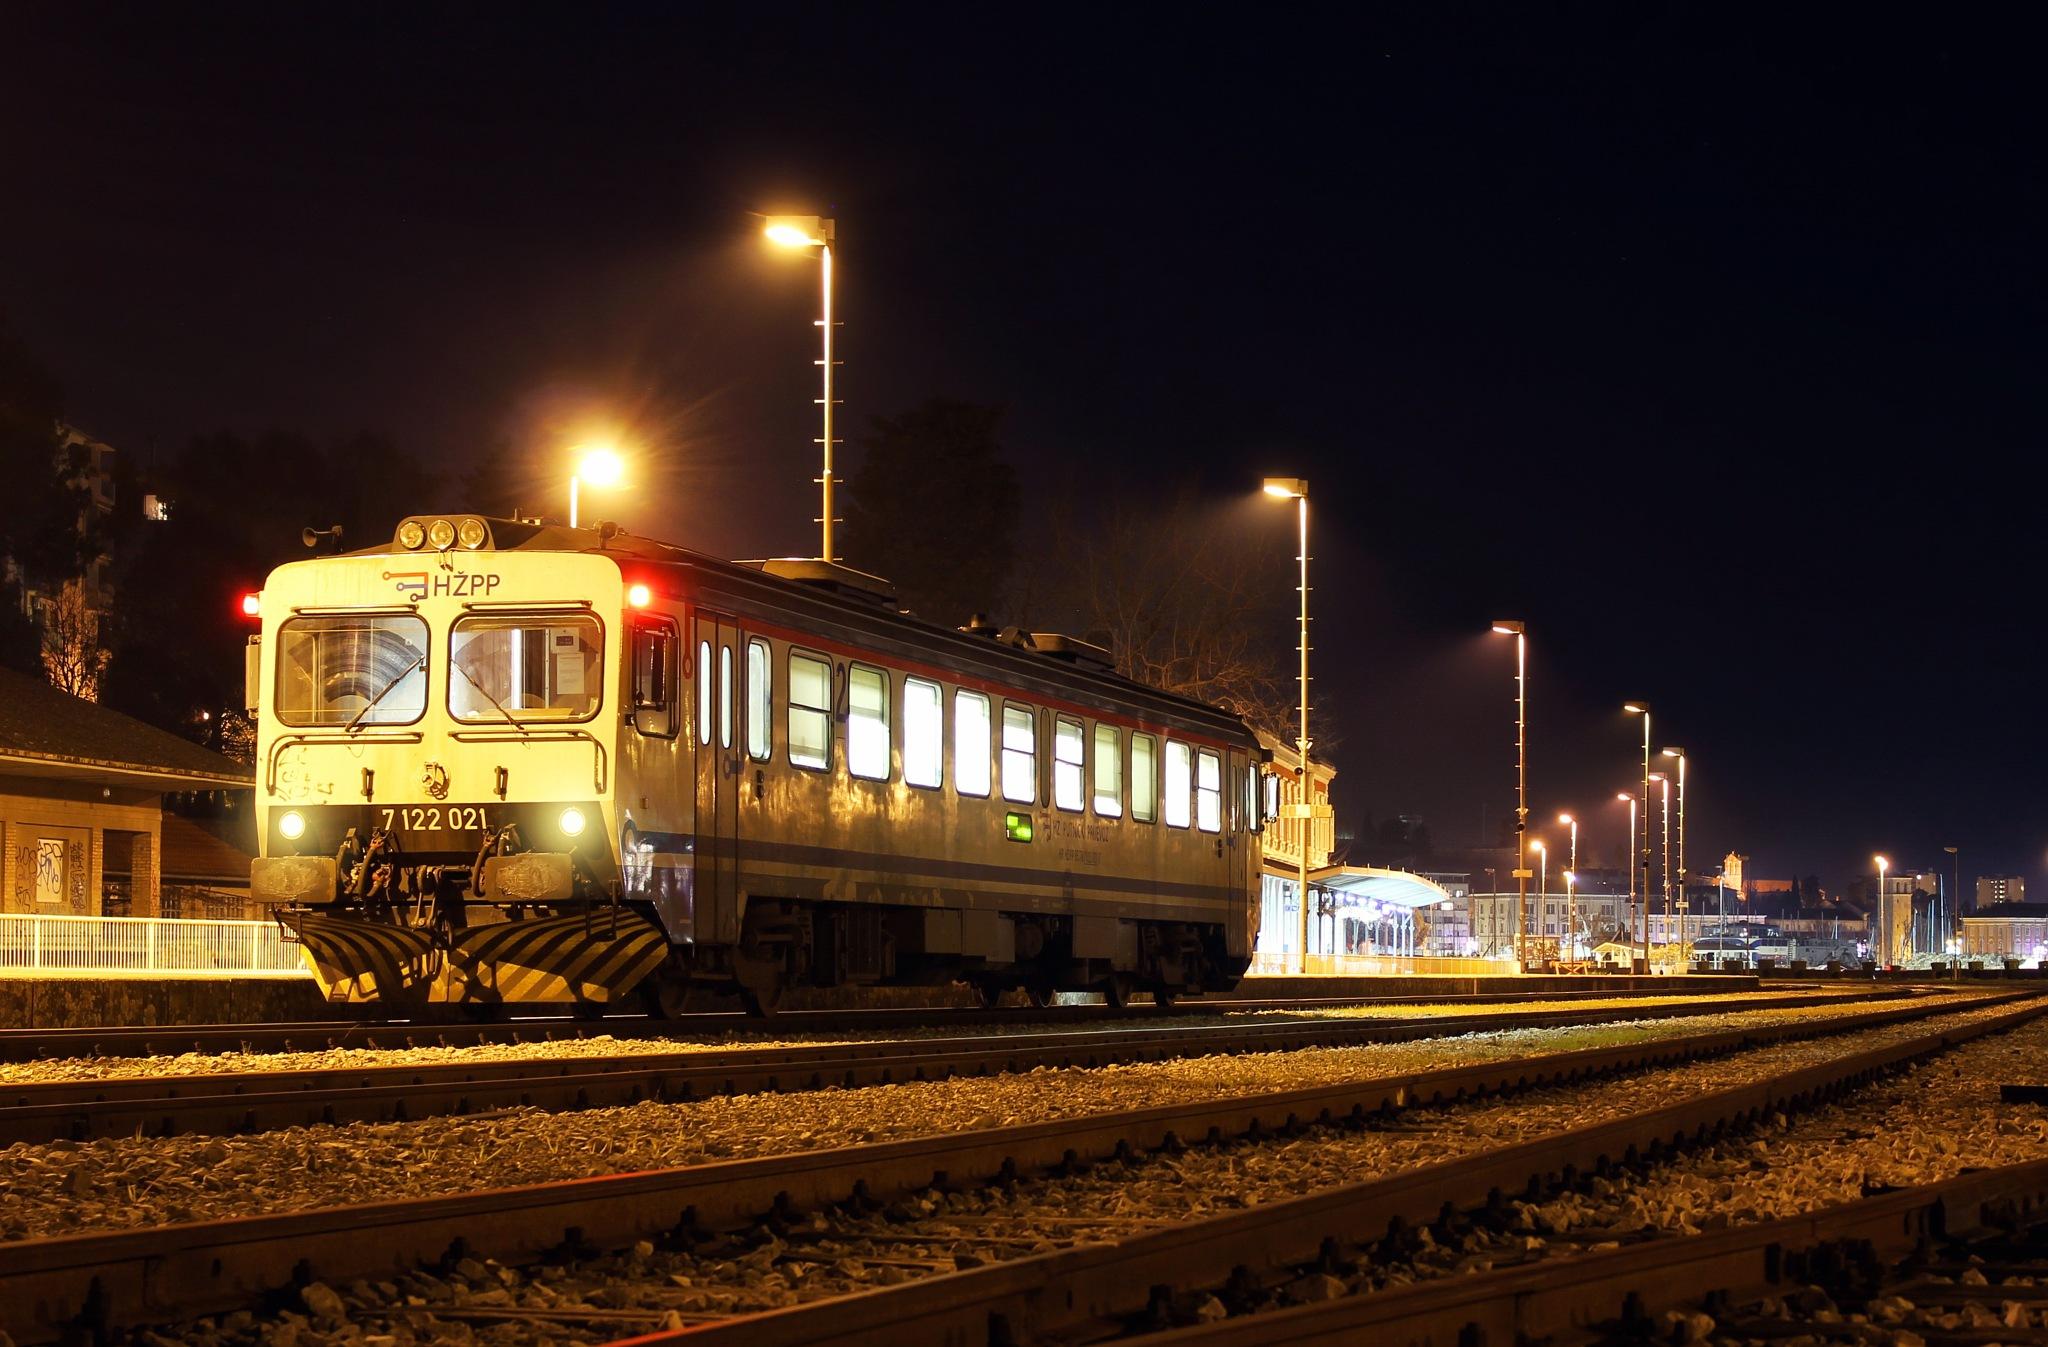 last train for tonight by Kristijan Siladic